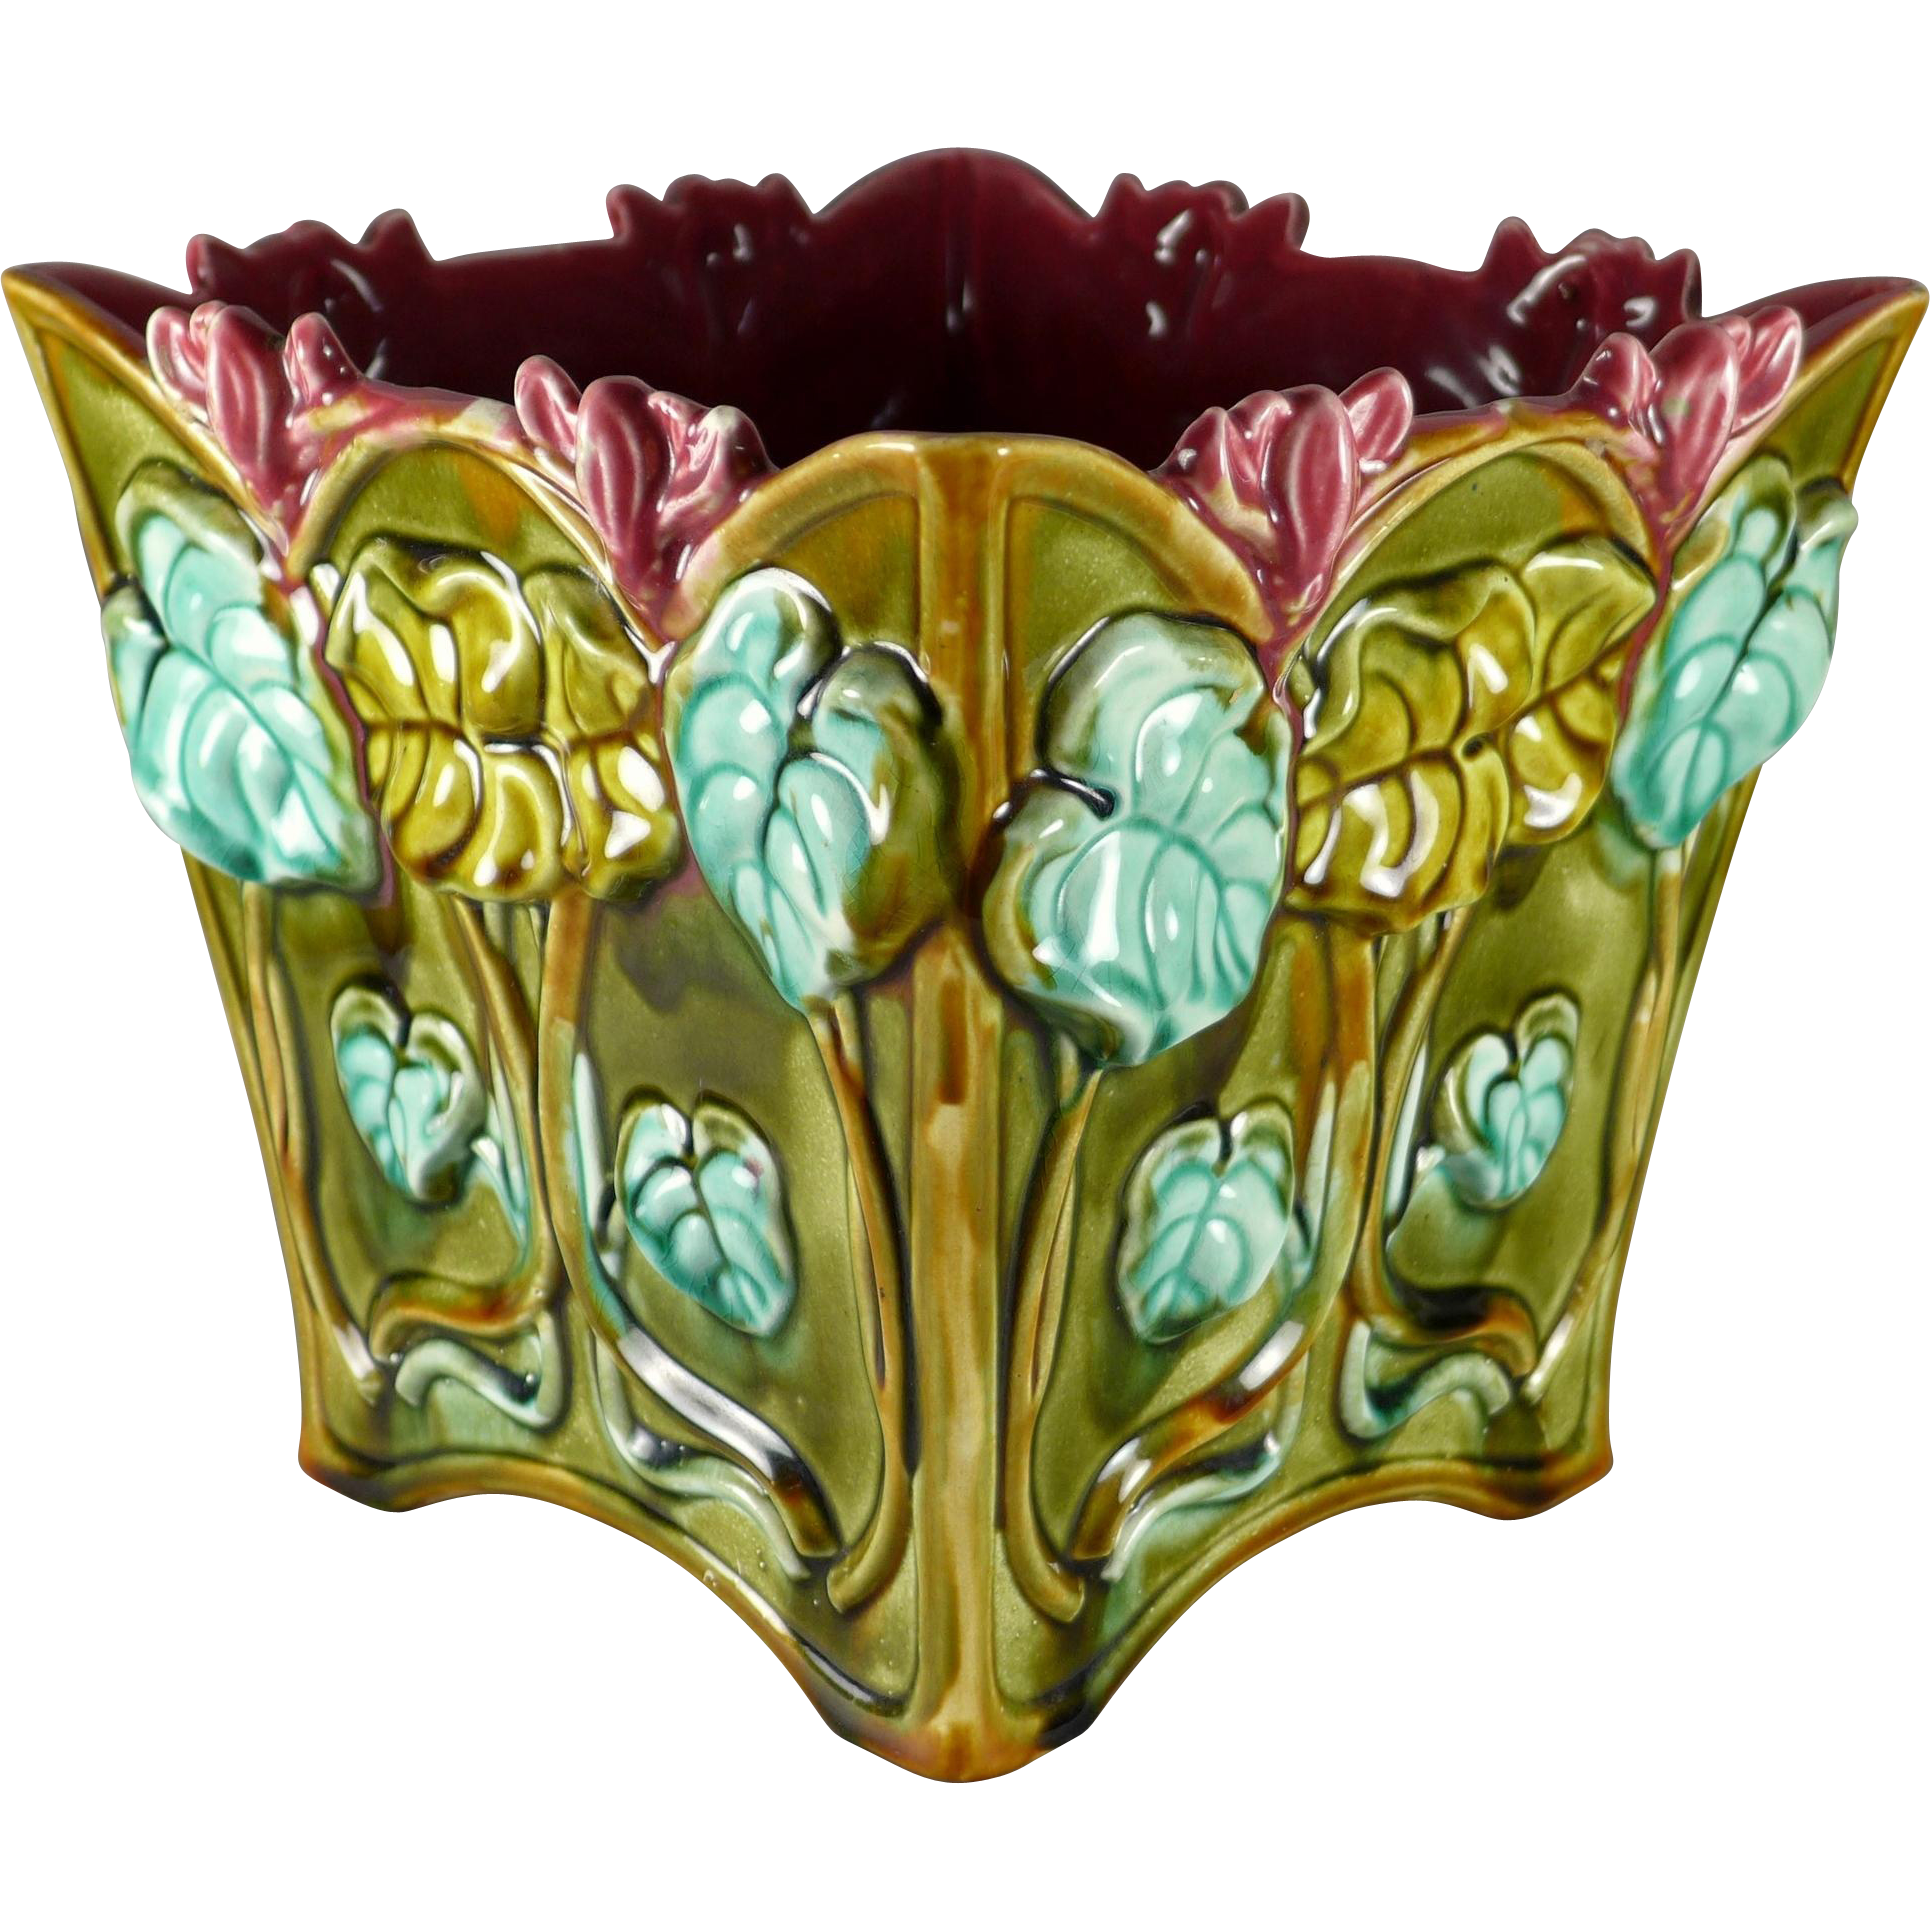 Antique Art Nouveau French Majolica Frie Onnaing 8 inch Cache Pot / Jardiniere